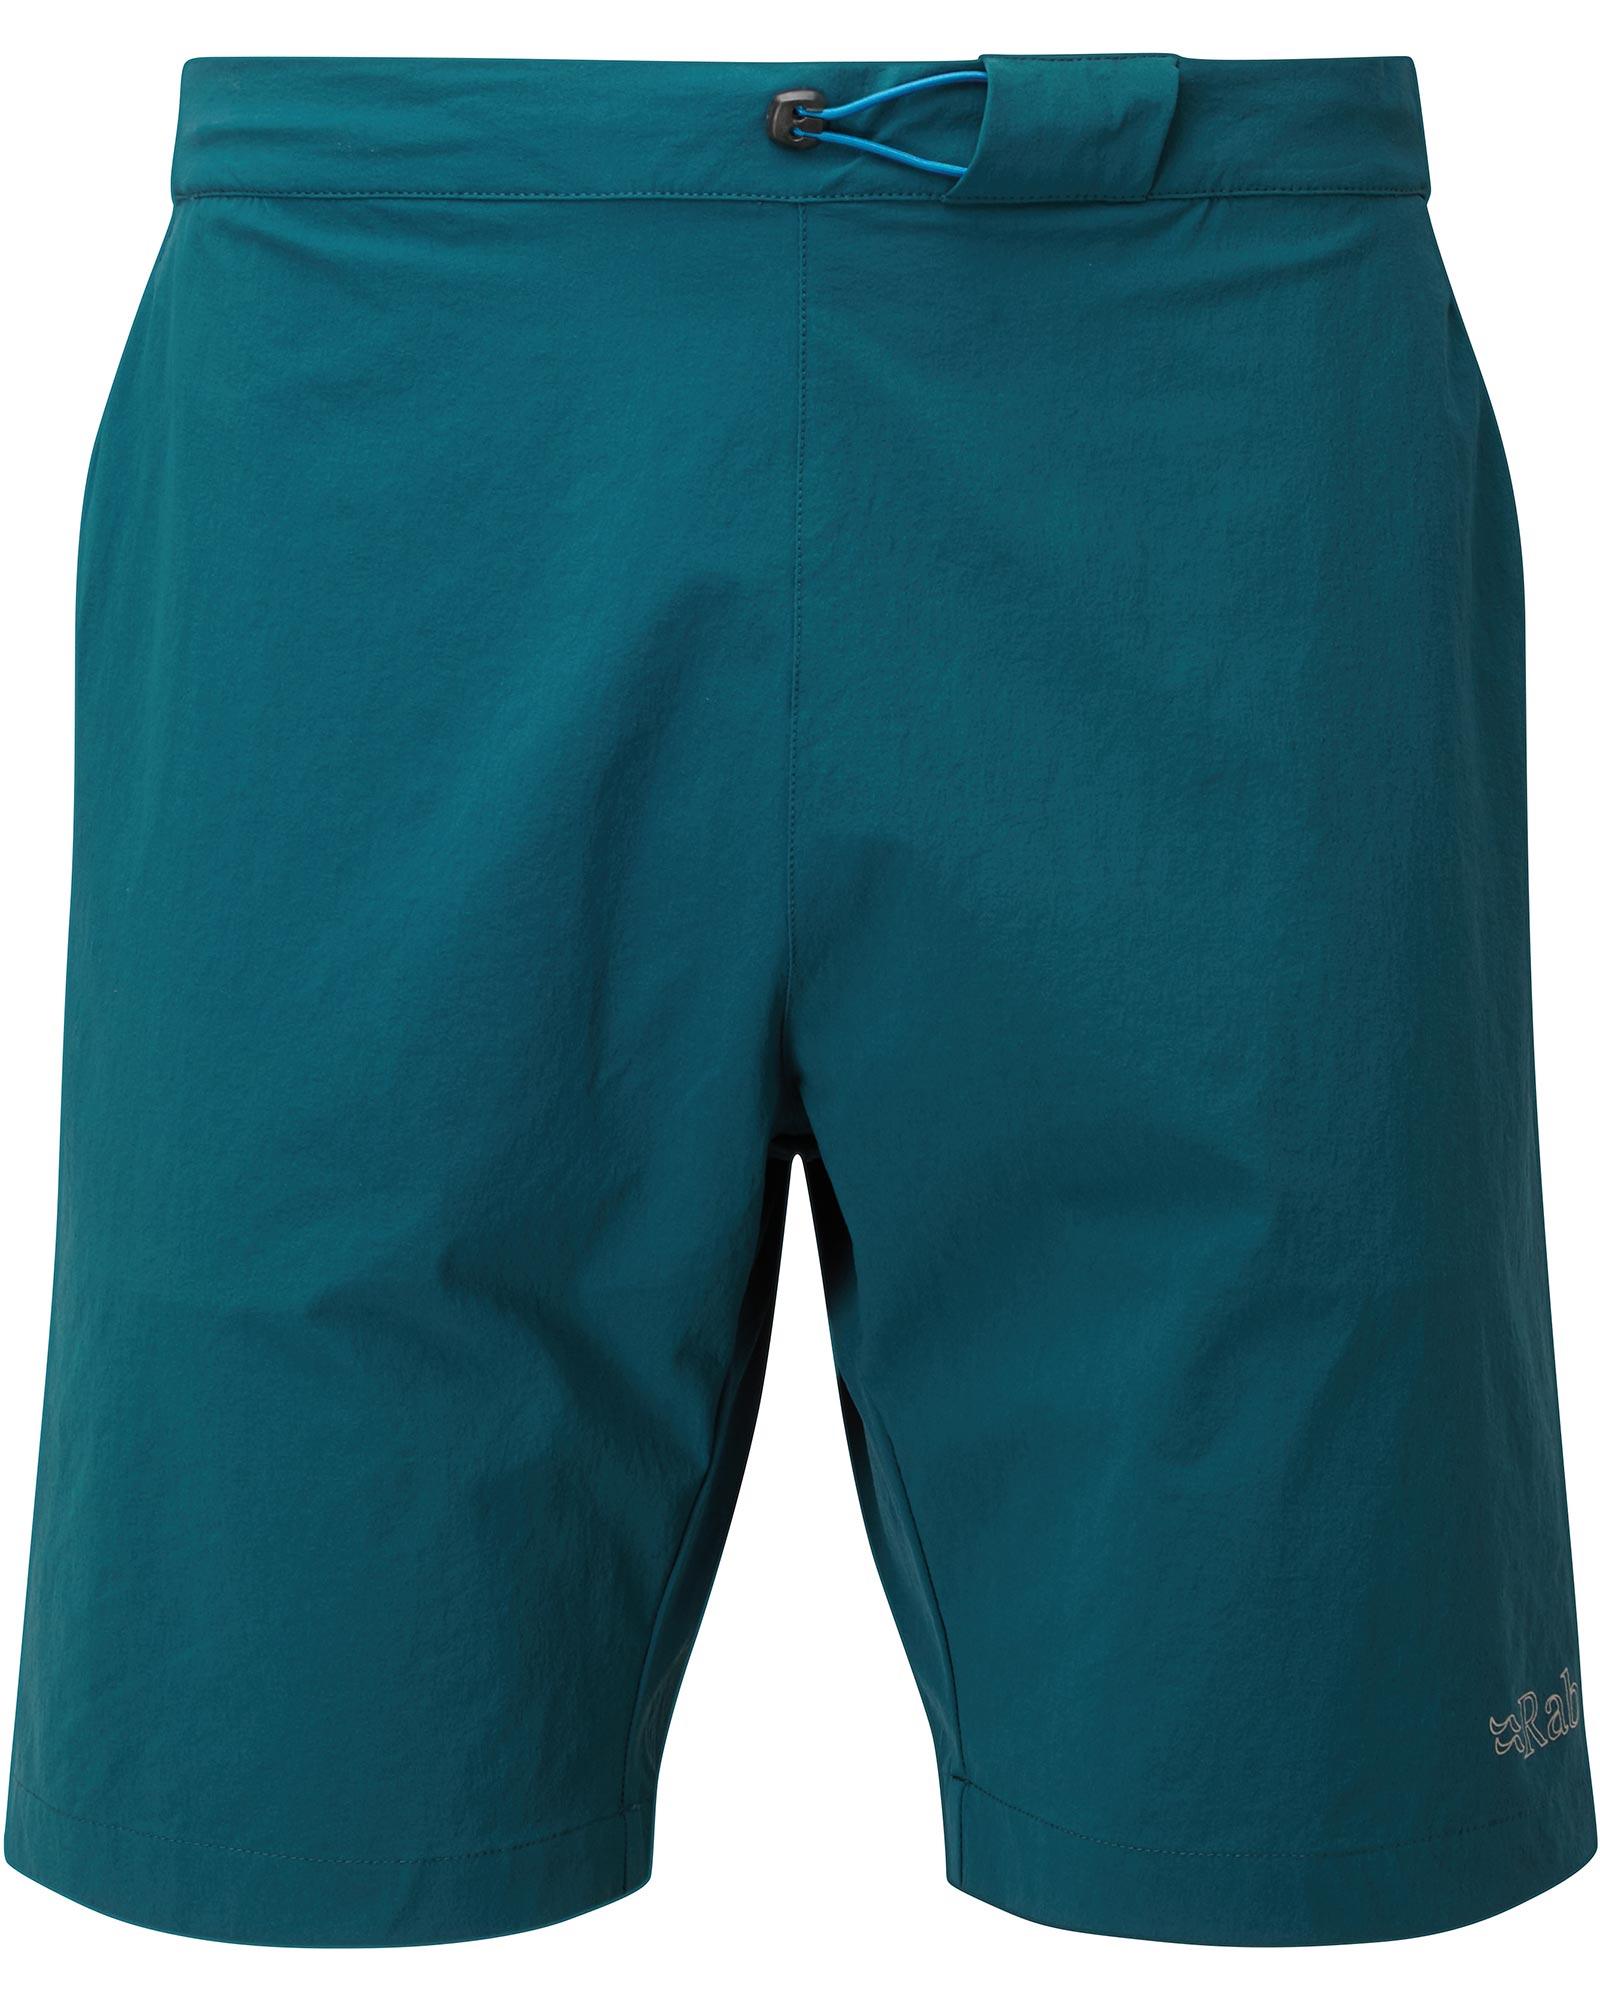 Product image of Rab Men's Momentum Shorts